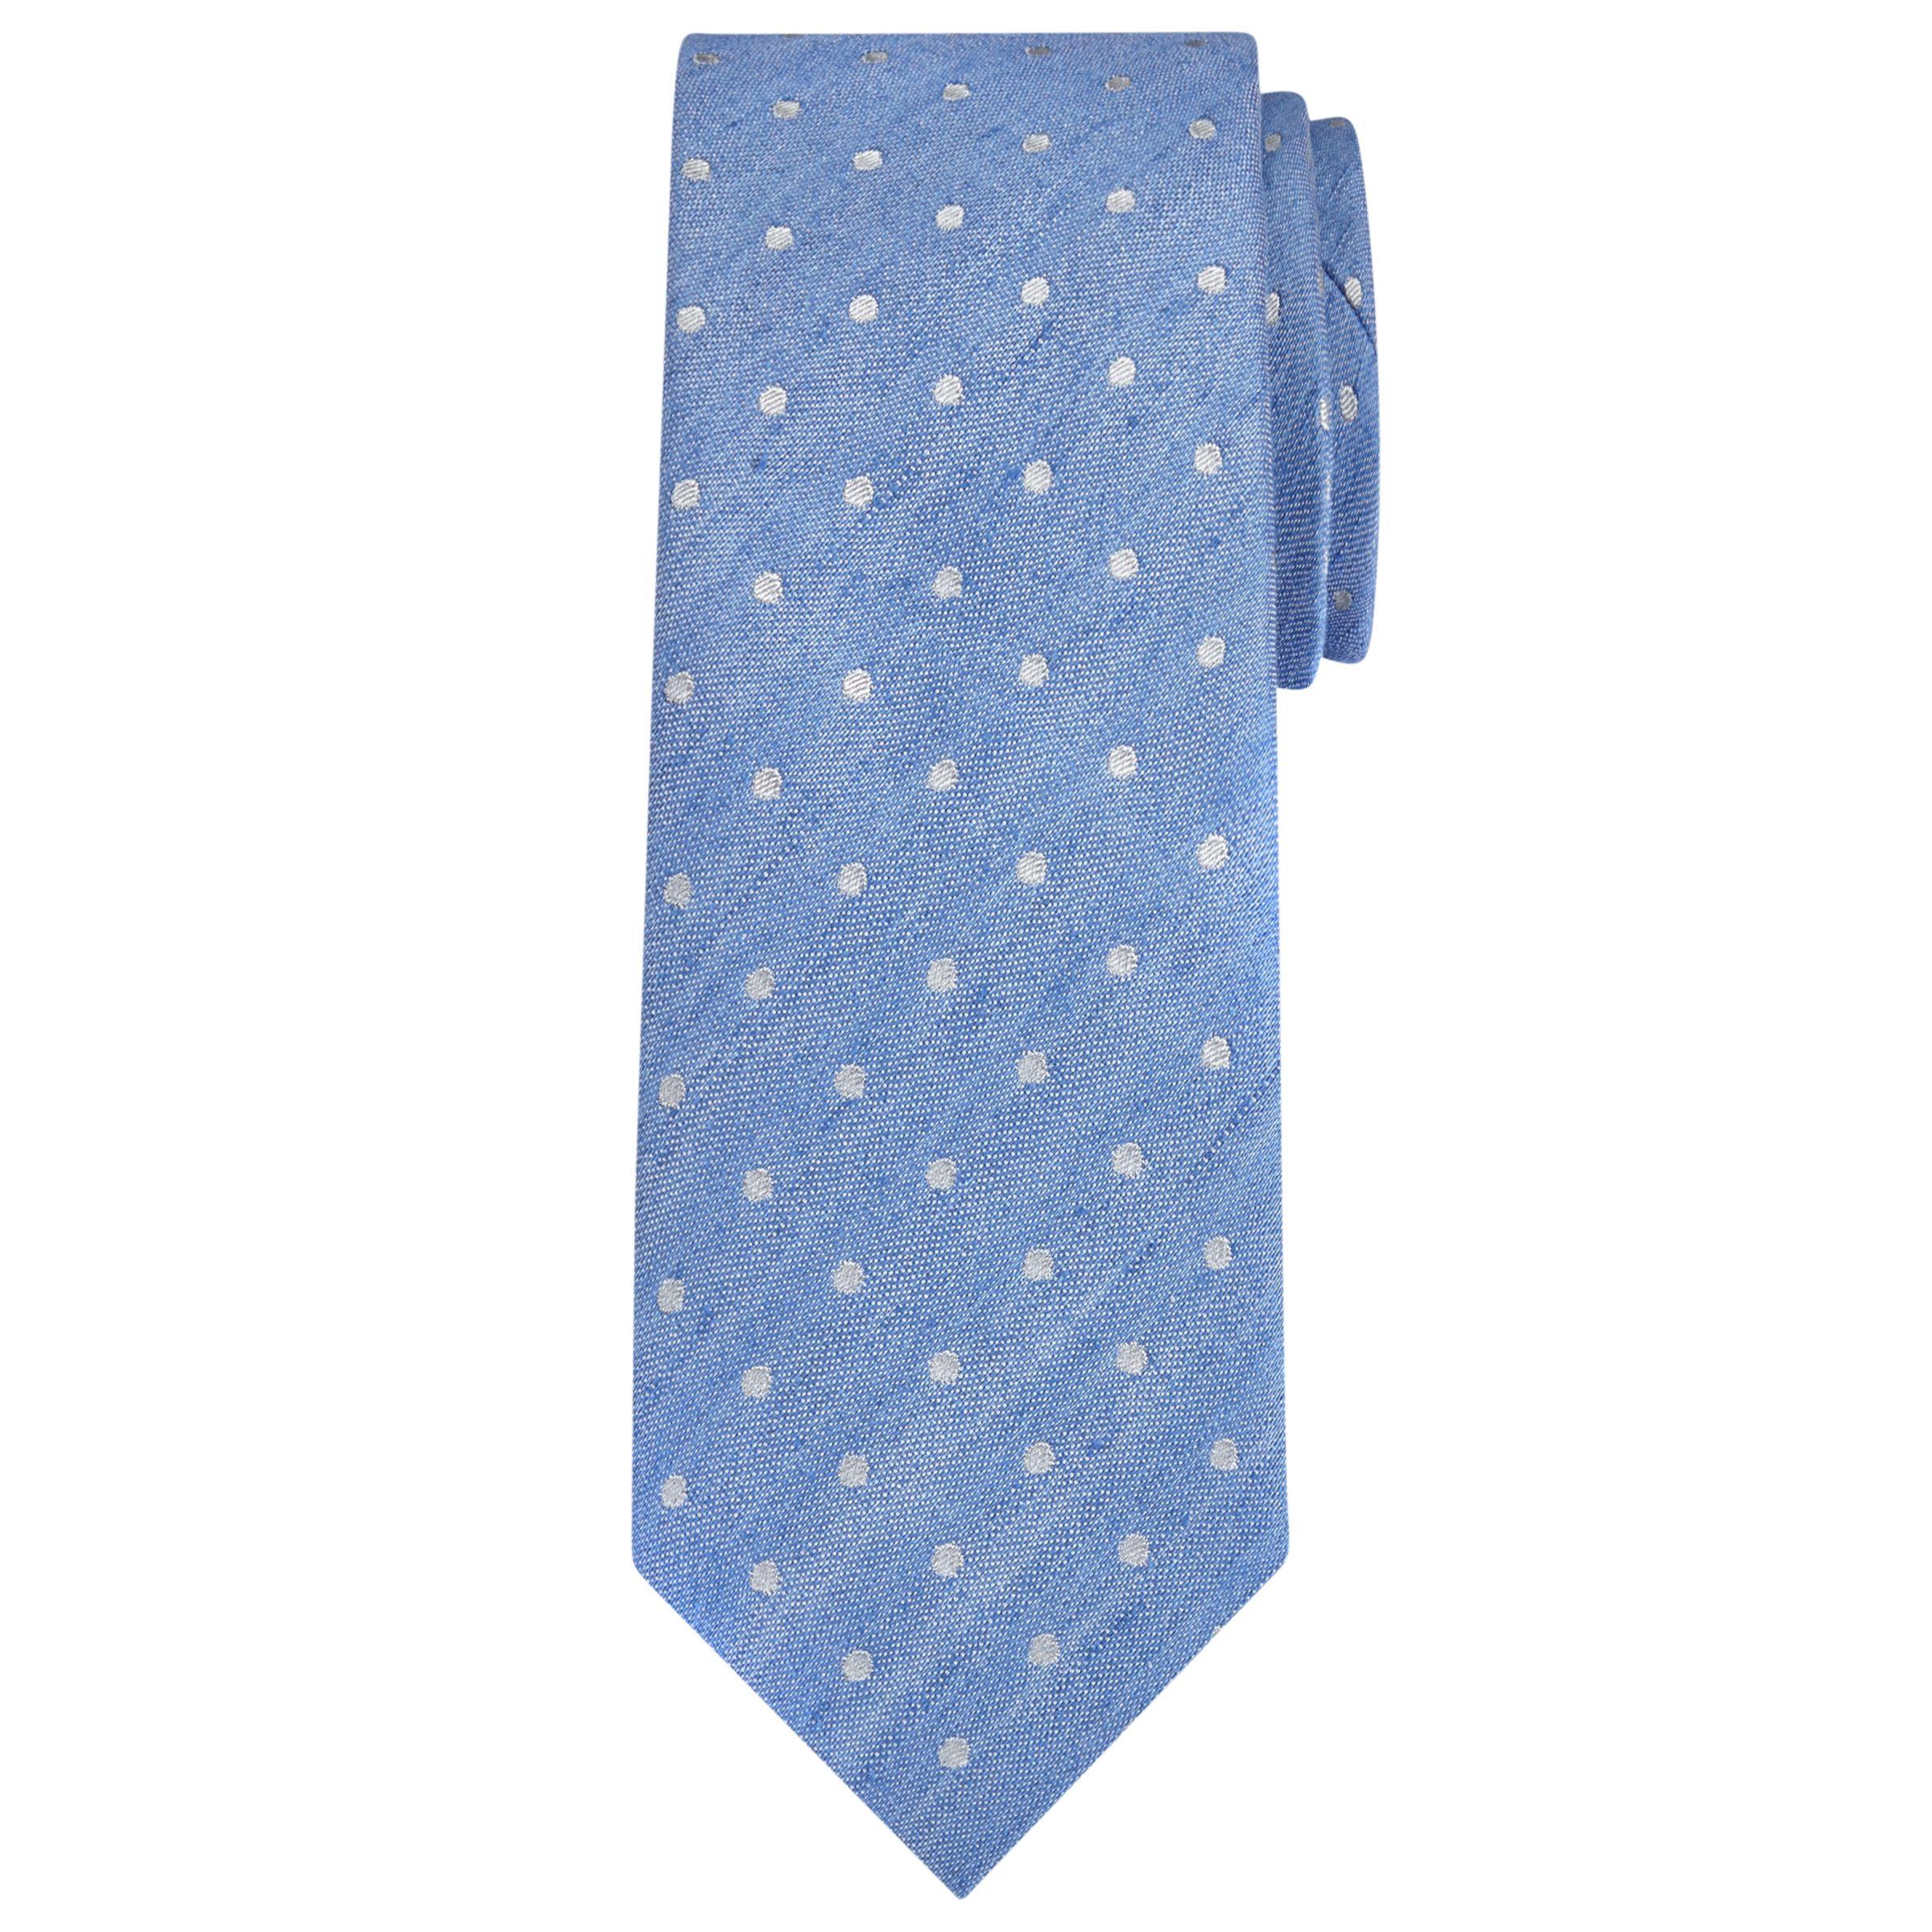 Richard James Mayfair Richard James Mayfair Spot Linen Silk Tie, Sky Blue/White